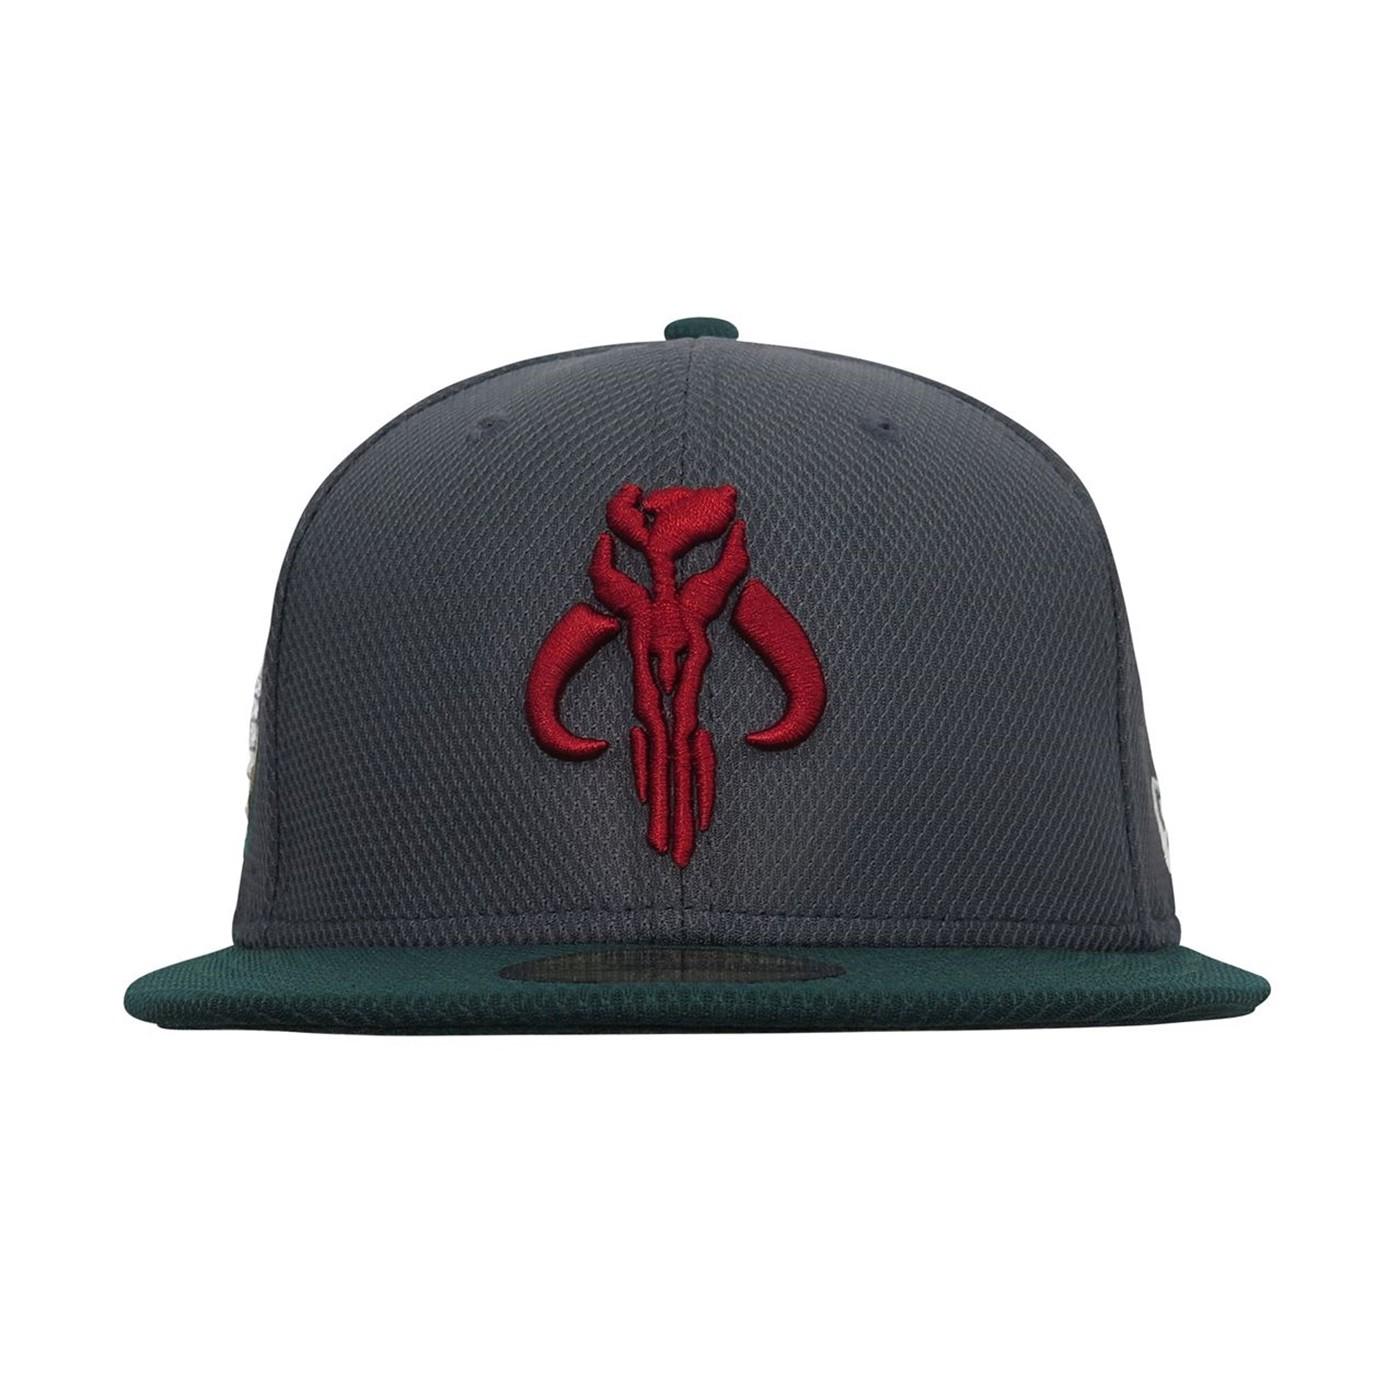 Star Wars Boba Fett Mandalorian 59Fifty Fitted Hat